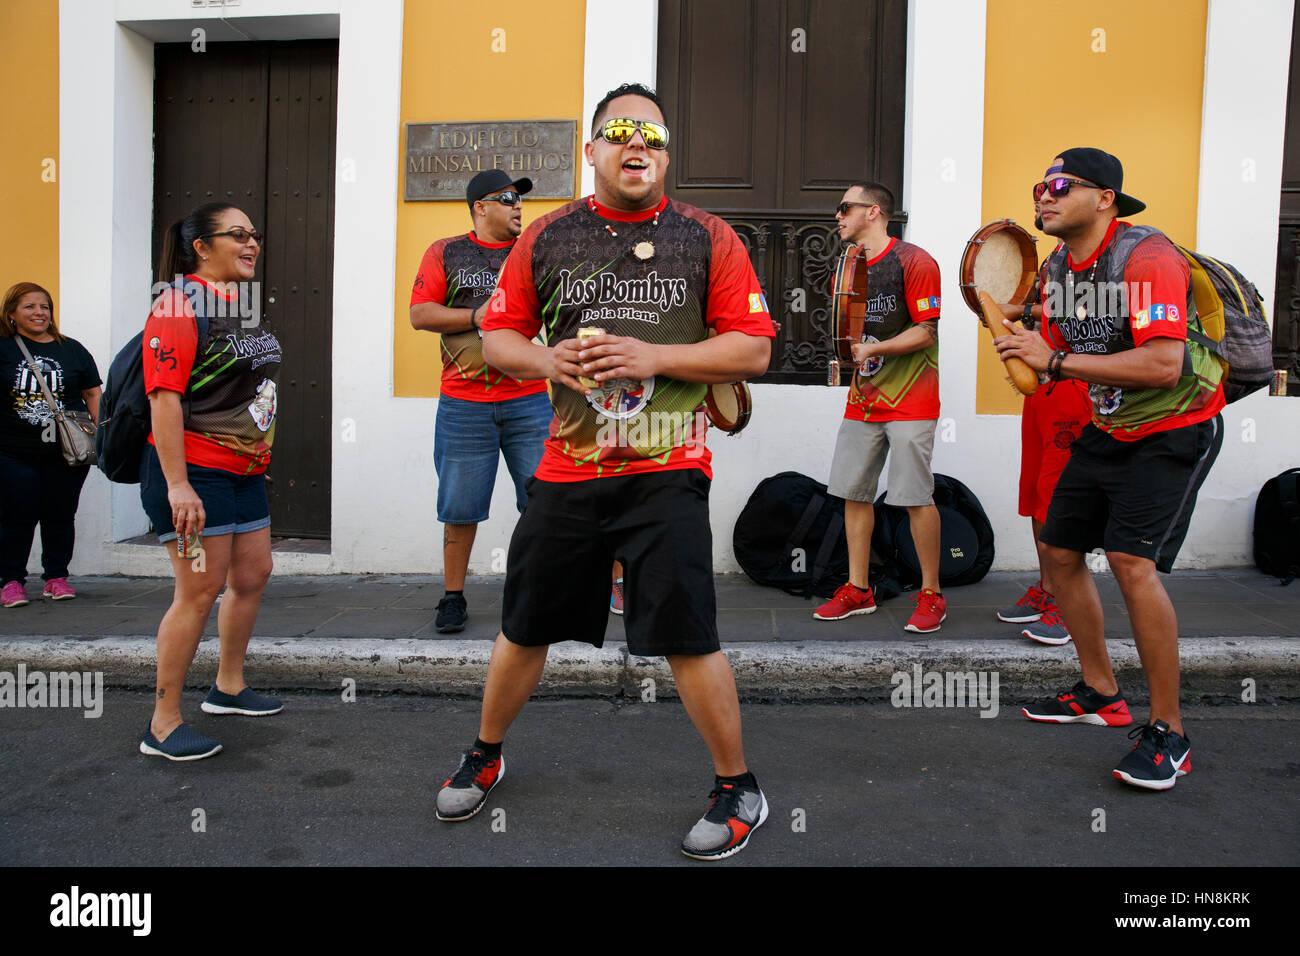 Musical group street performance, San Sebastian Festival, San Juan, Puerto Rico - Stock Image